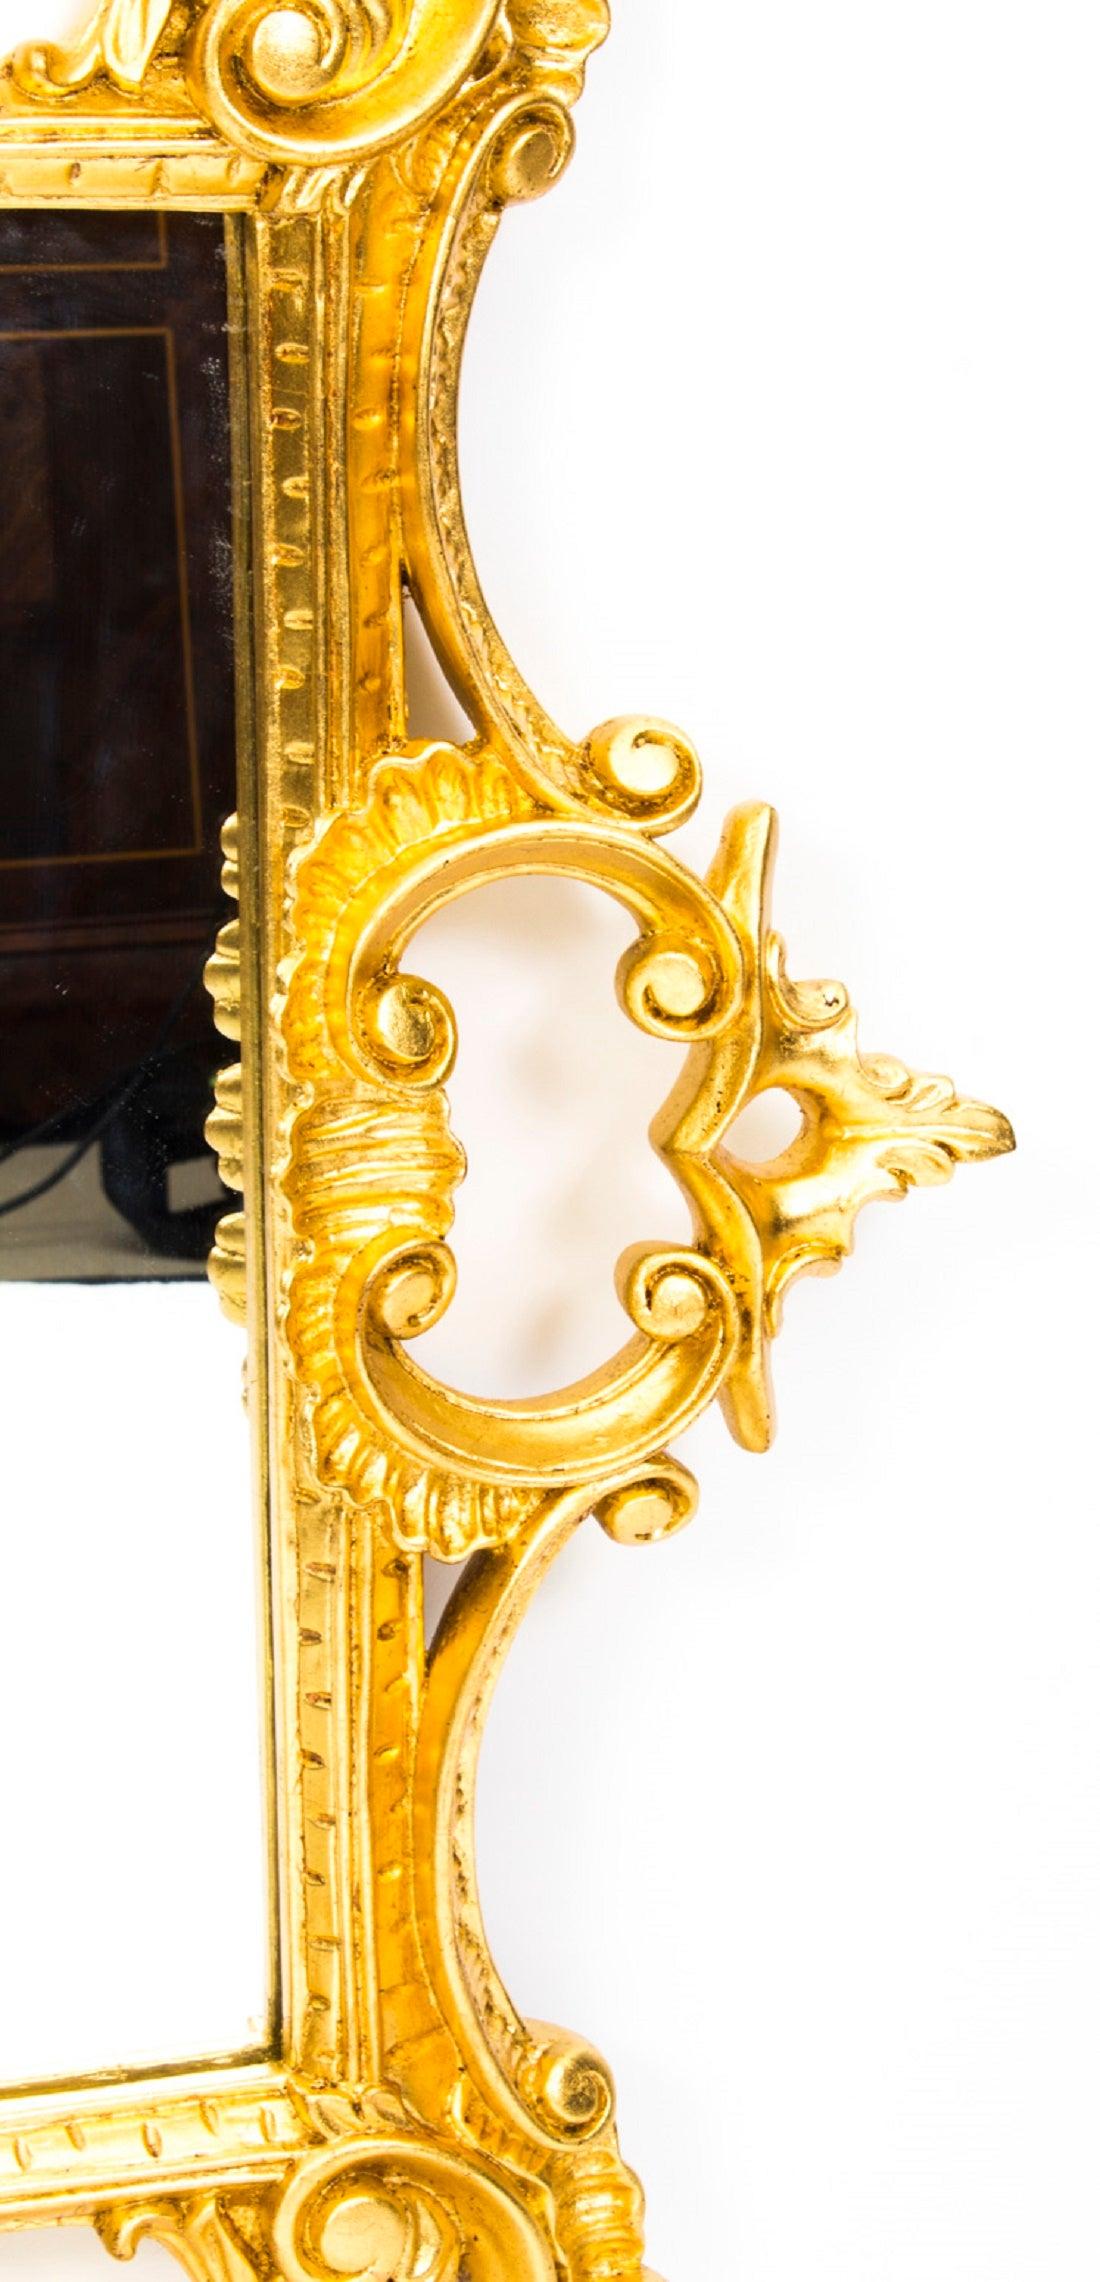 Superb Decorative Italian Giltwood Decorative Mirror For Sale at 1stdibs